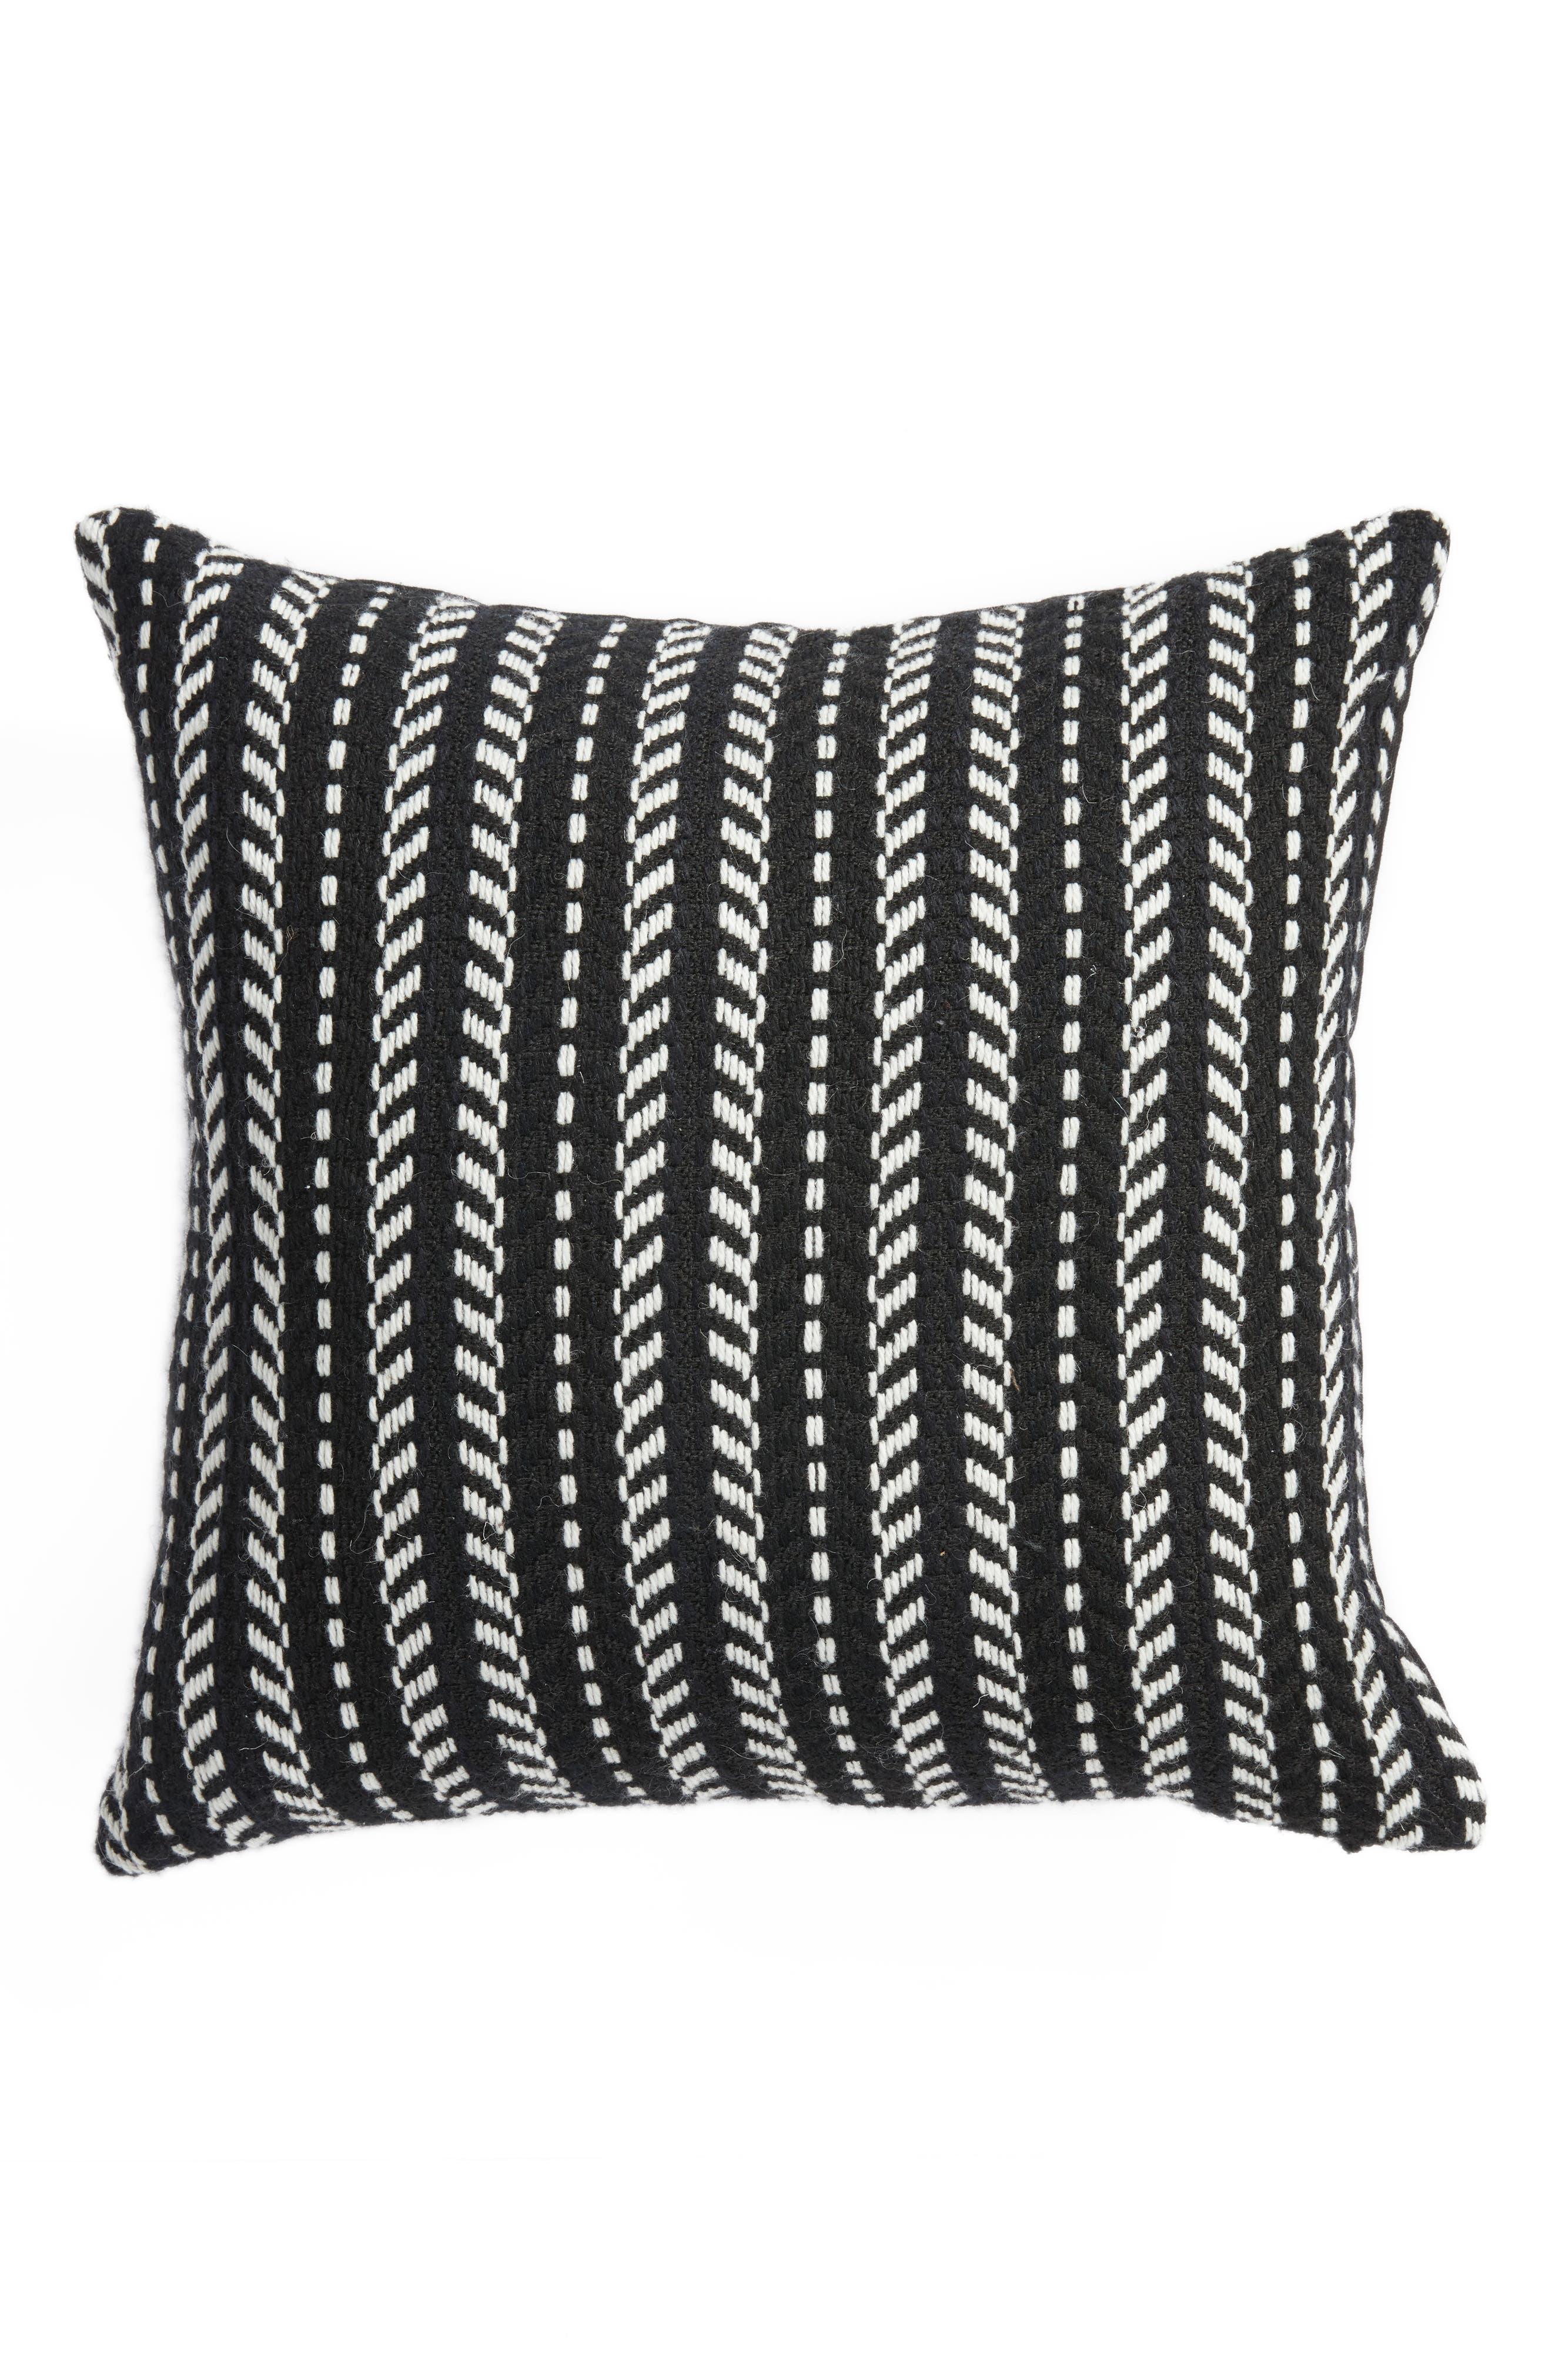 Main Image - Levtex Moroccan Woven Pillow